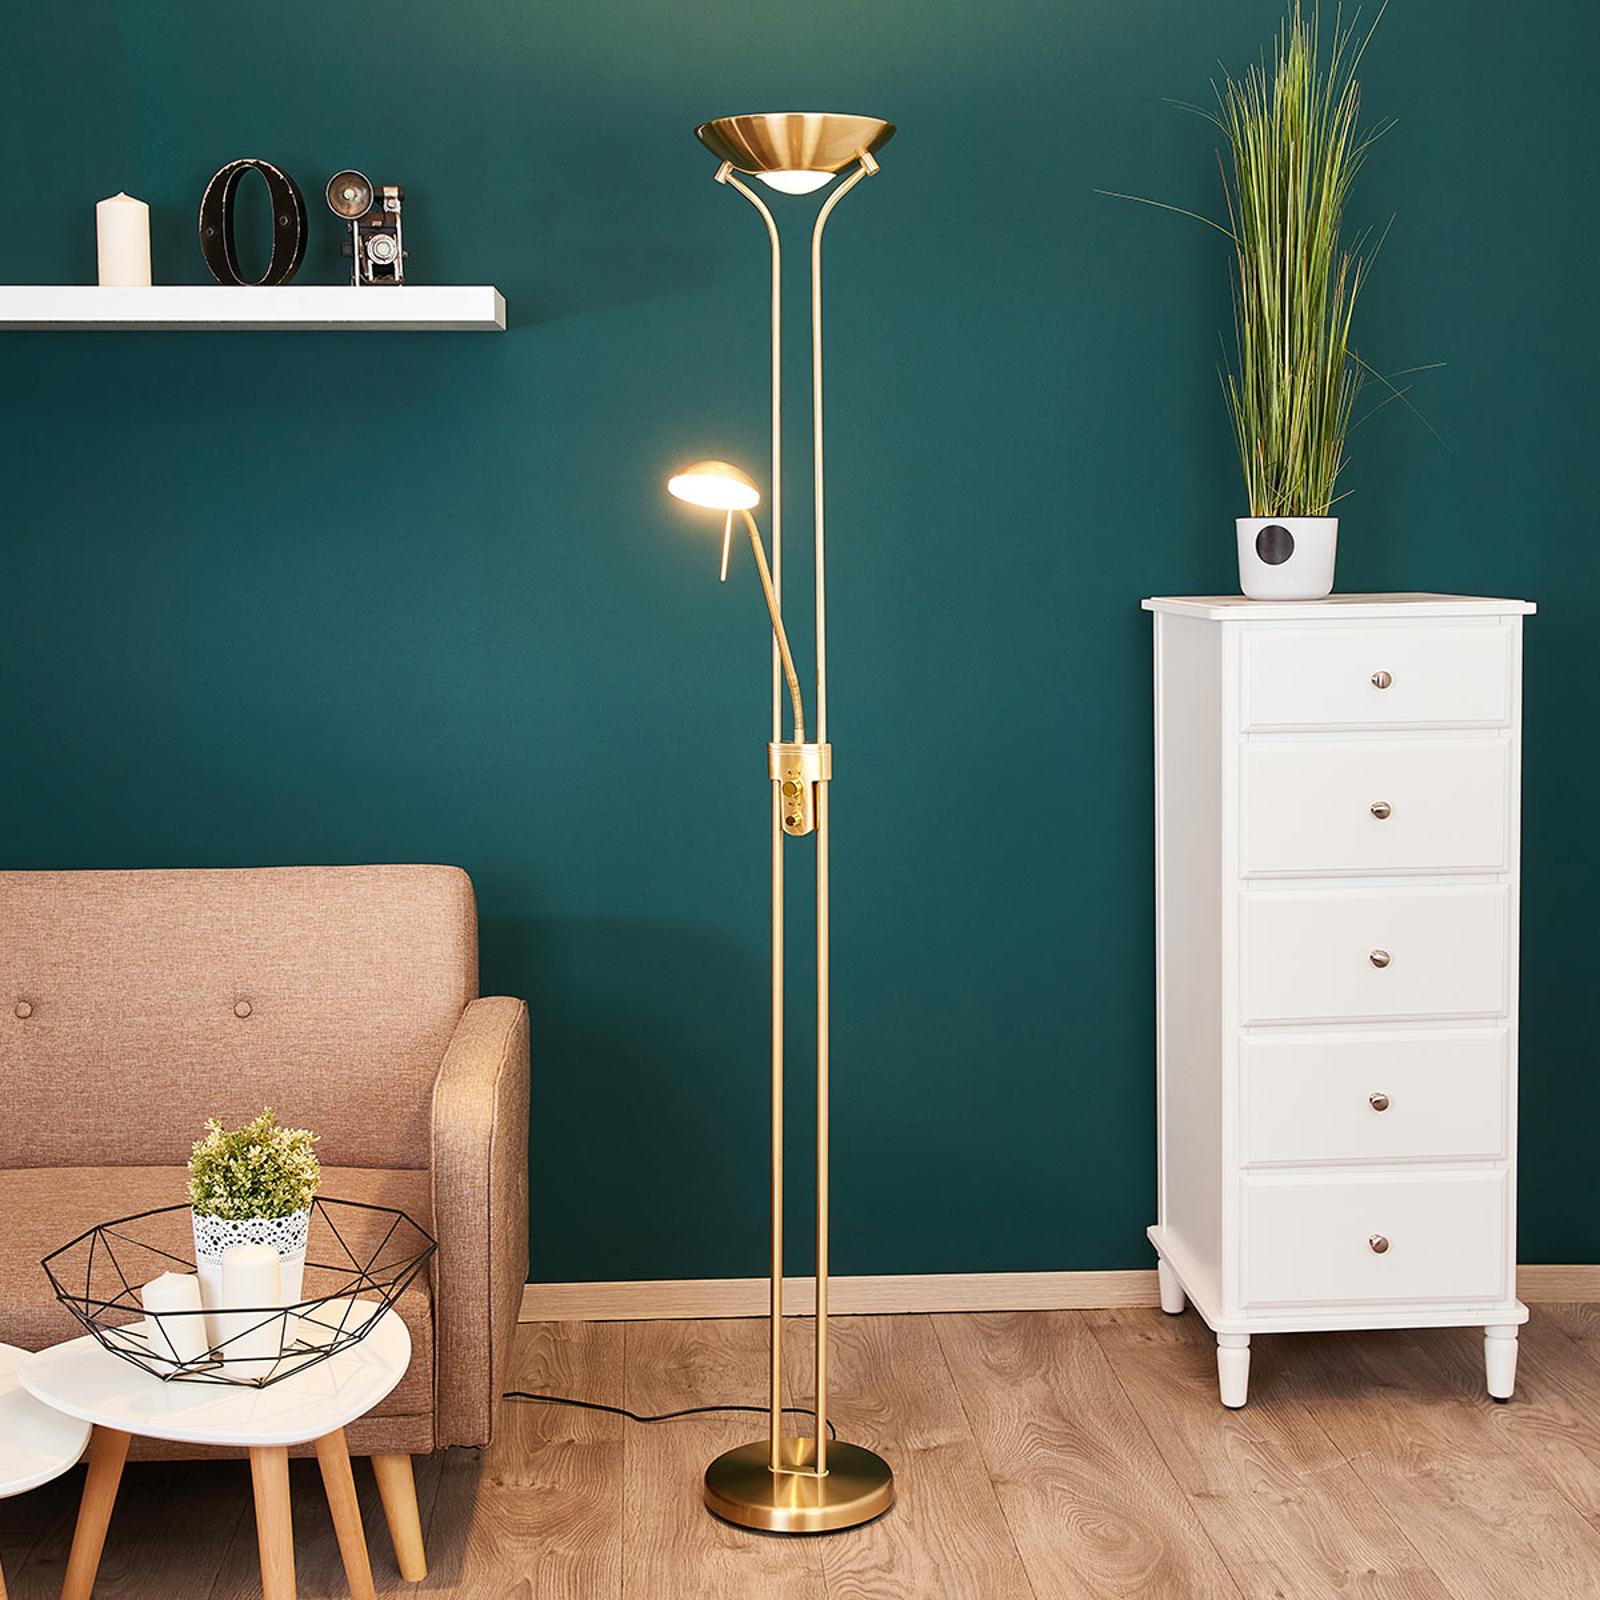 Lampadaire LED Josefin avec liseuse, laiton